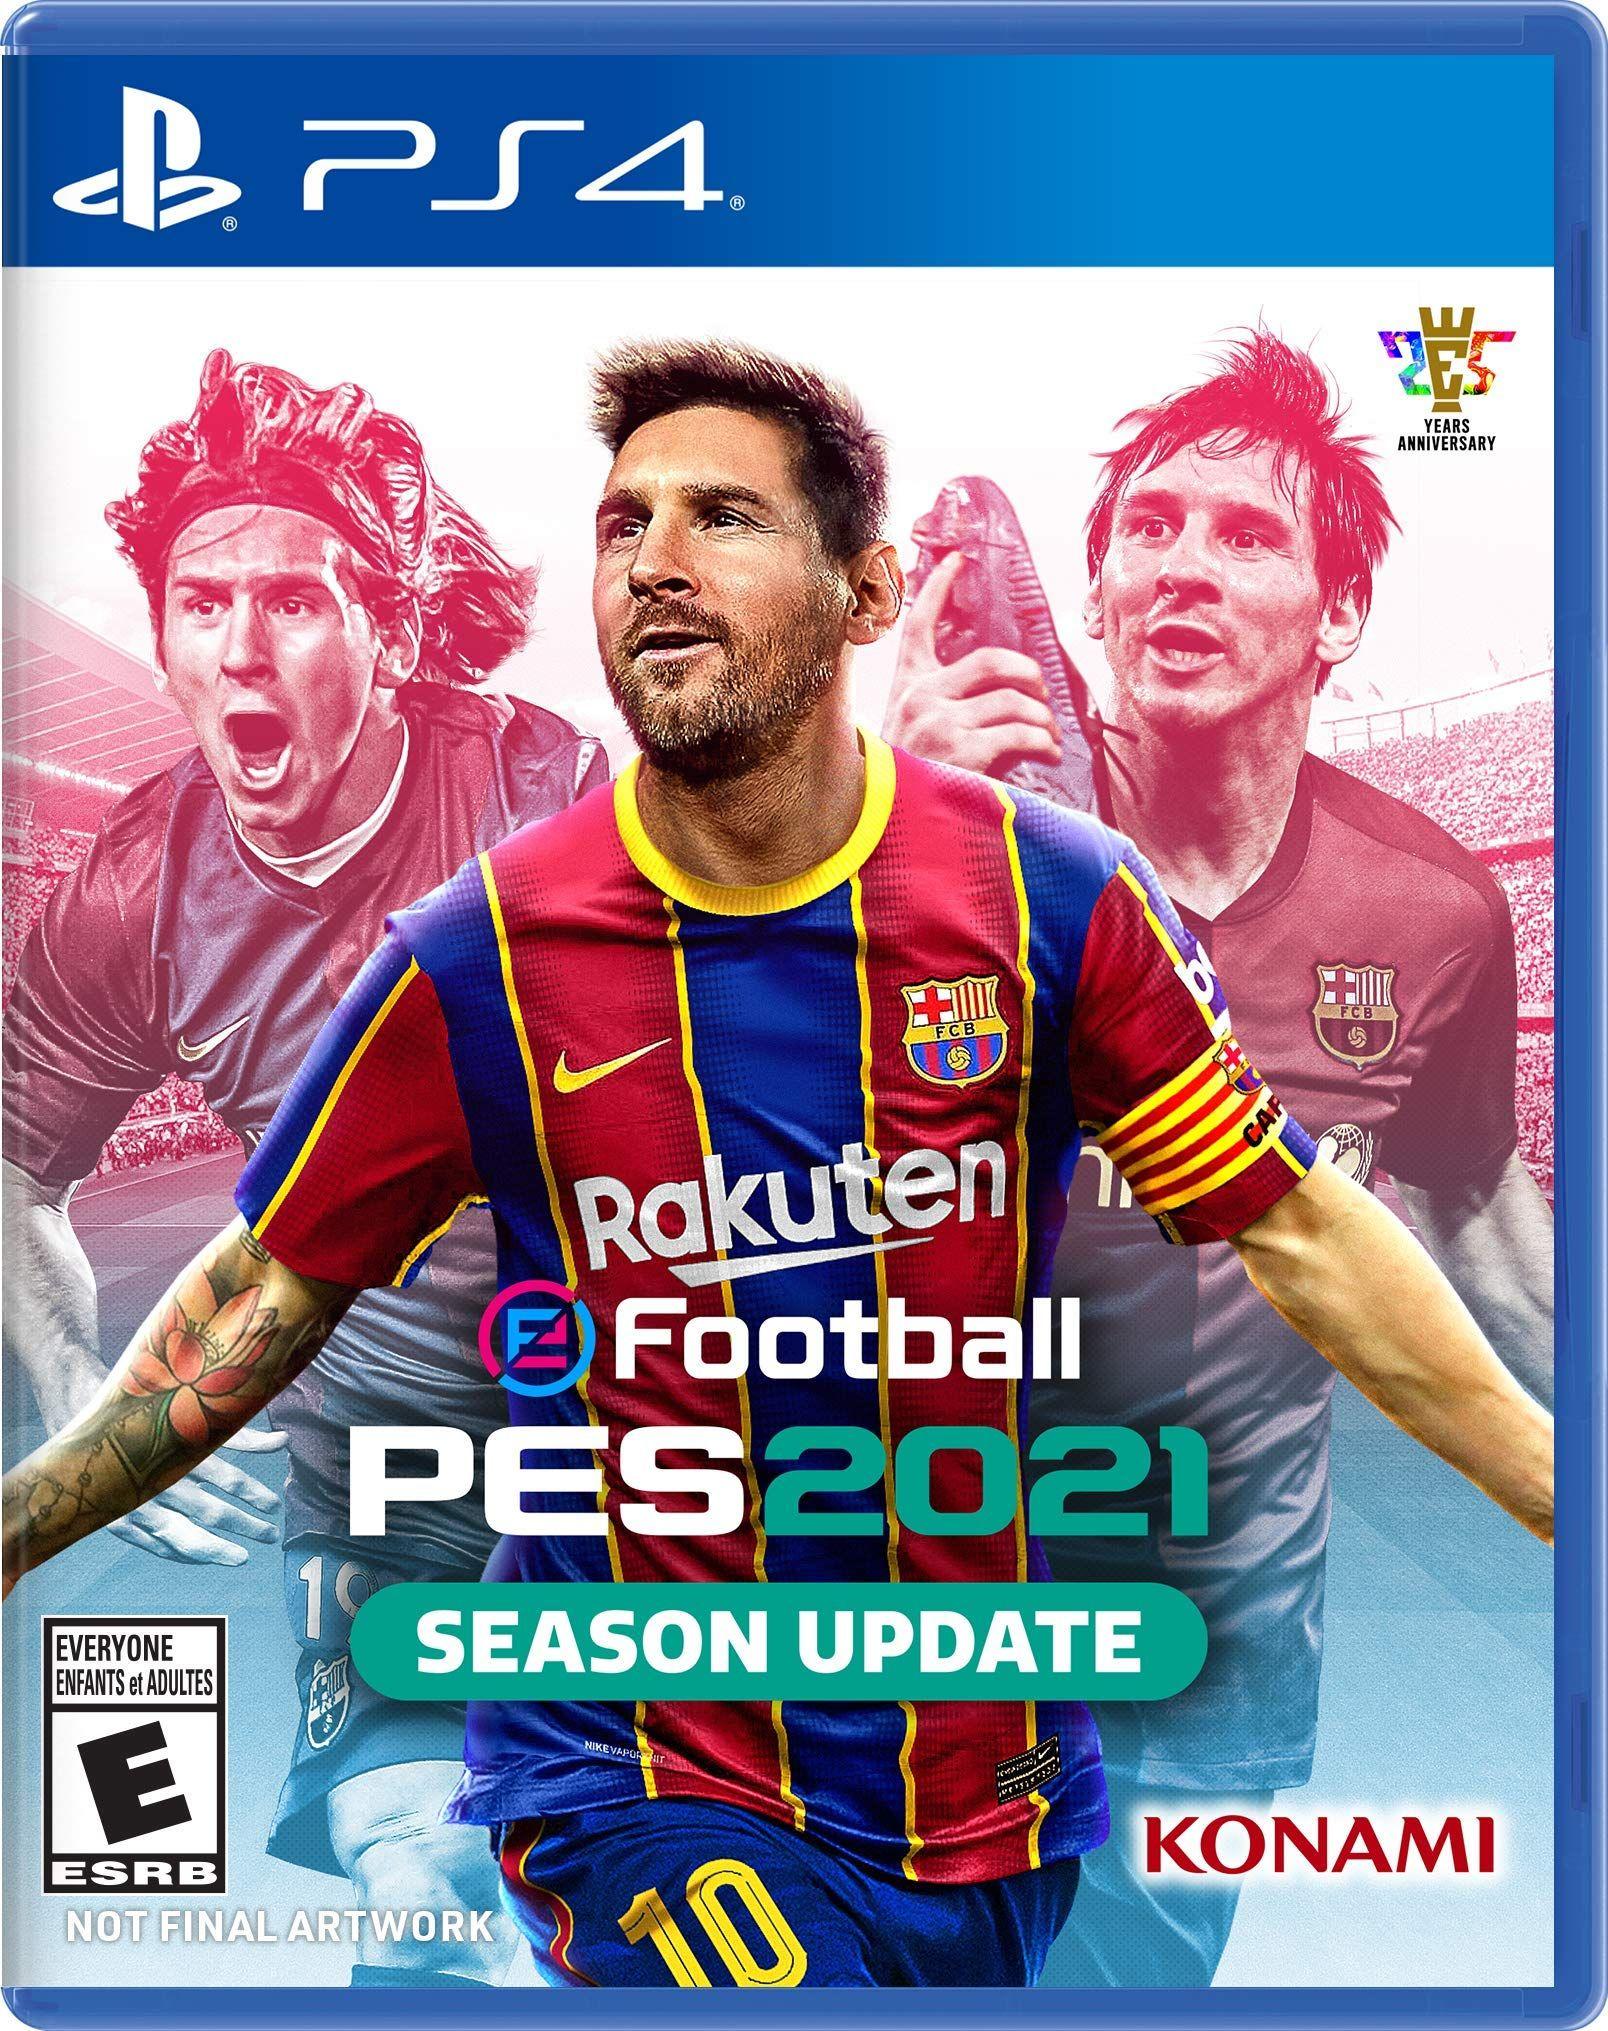 Efootball Pes 2021 Season Update Xbox One Xbox One Games Konami